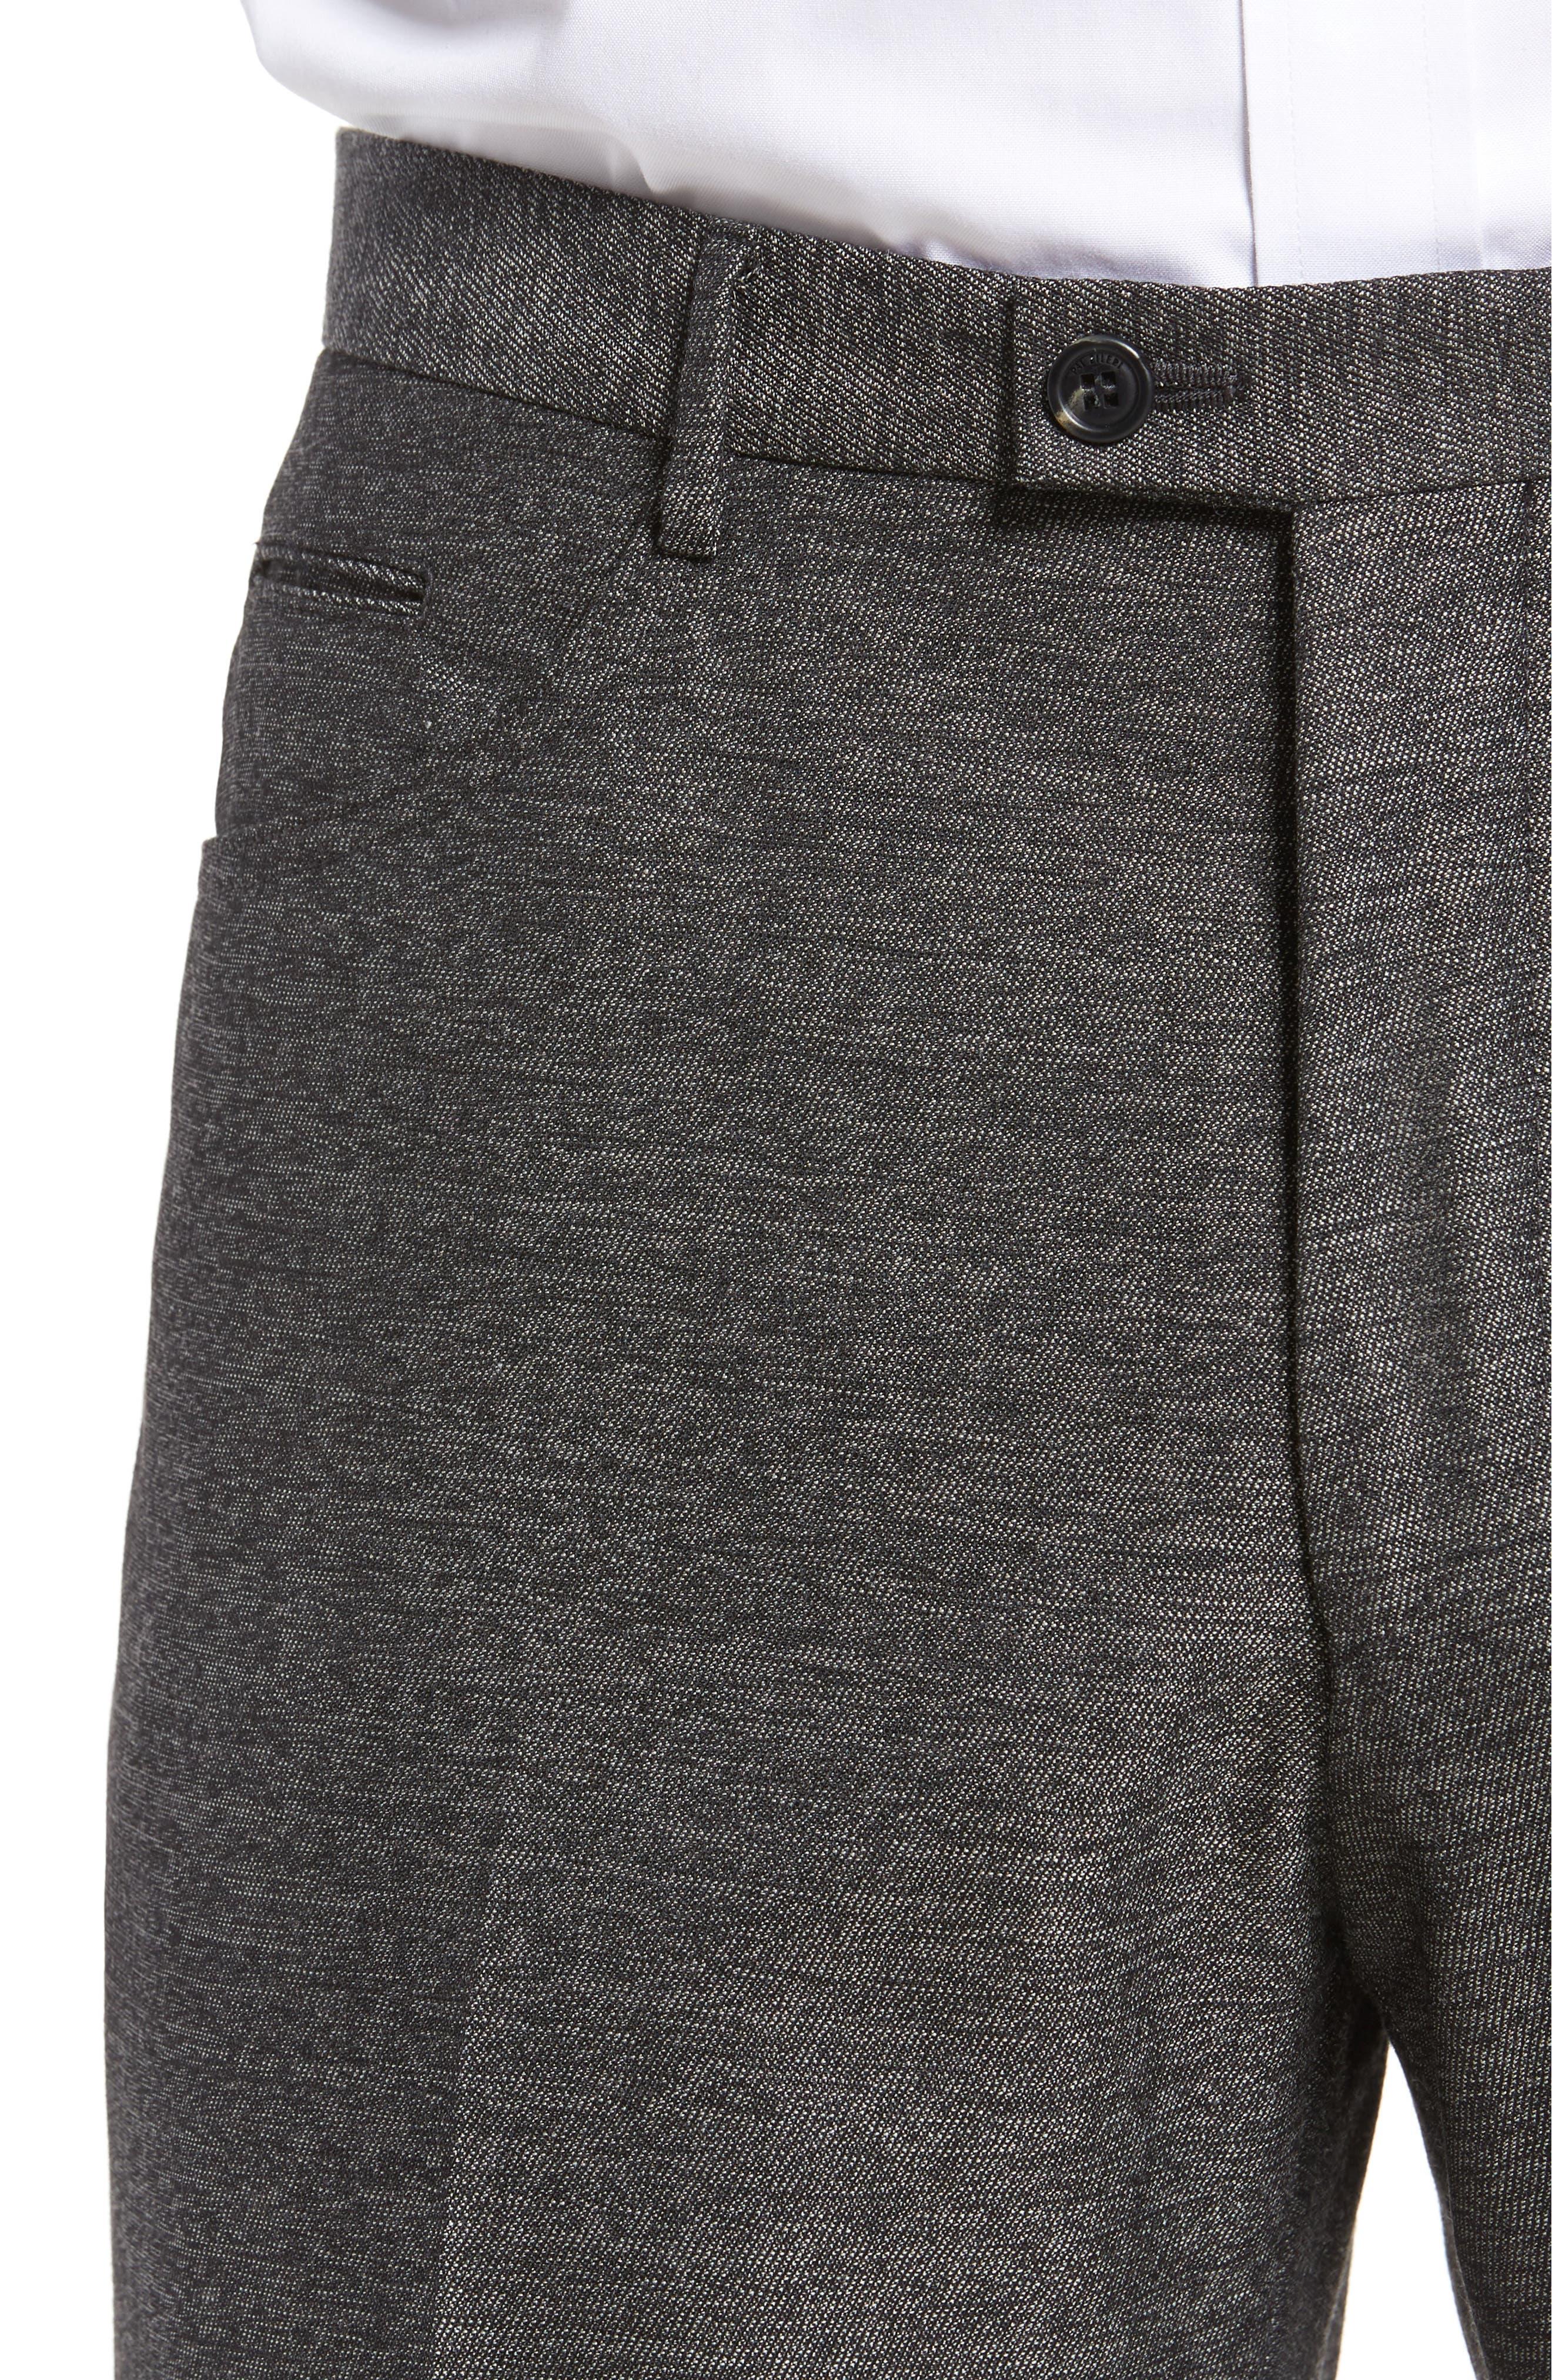 Sartorial Wool Five-Pocket Pants,                             Alternate thumbnail 4, color,                             Grey